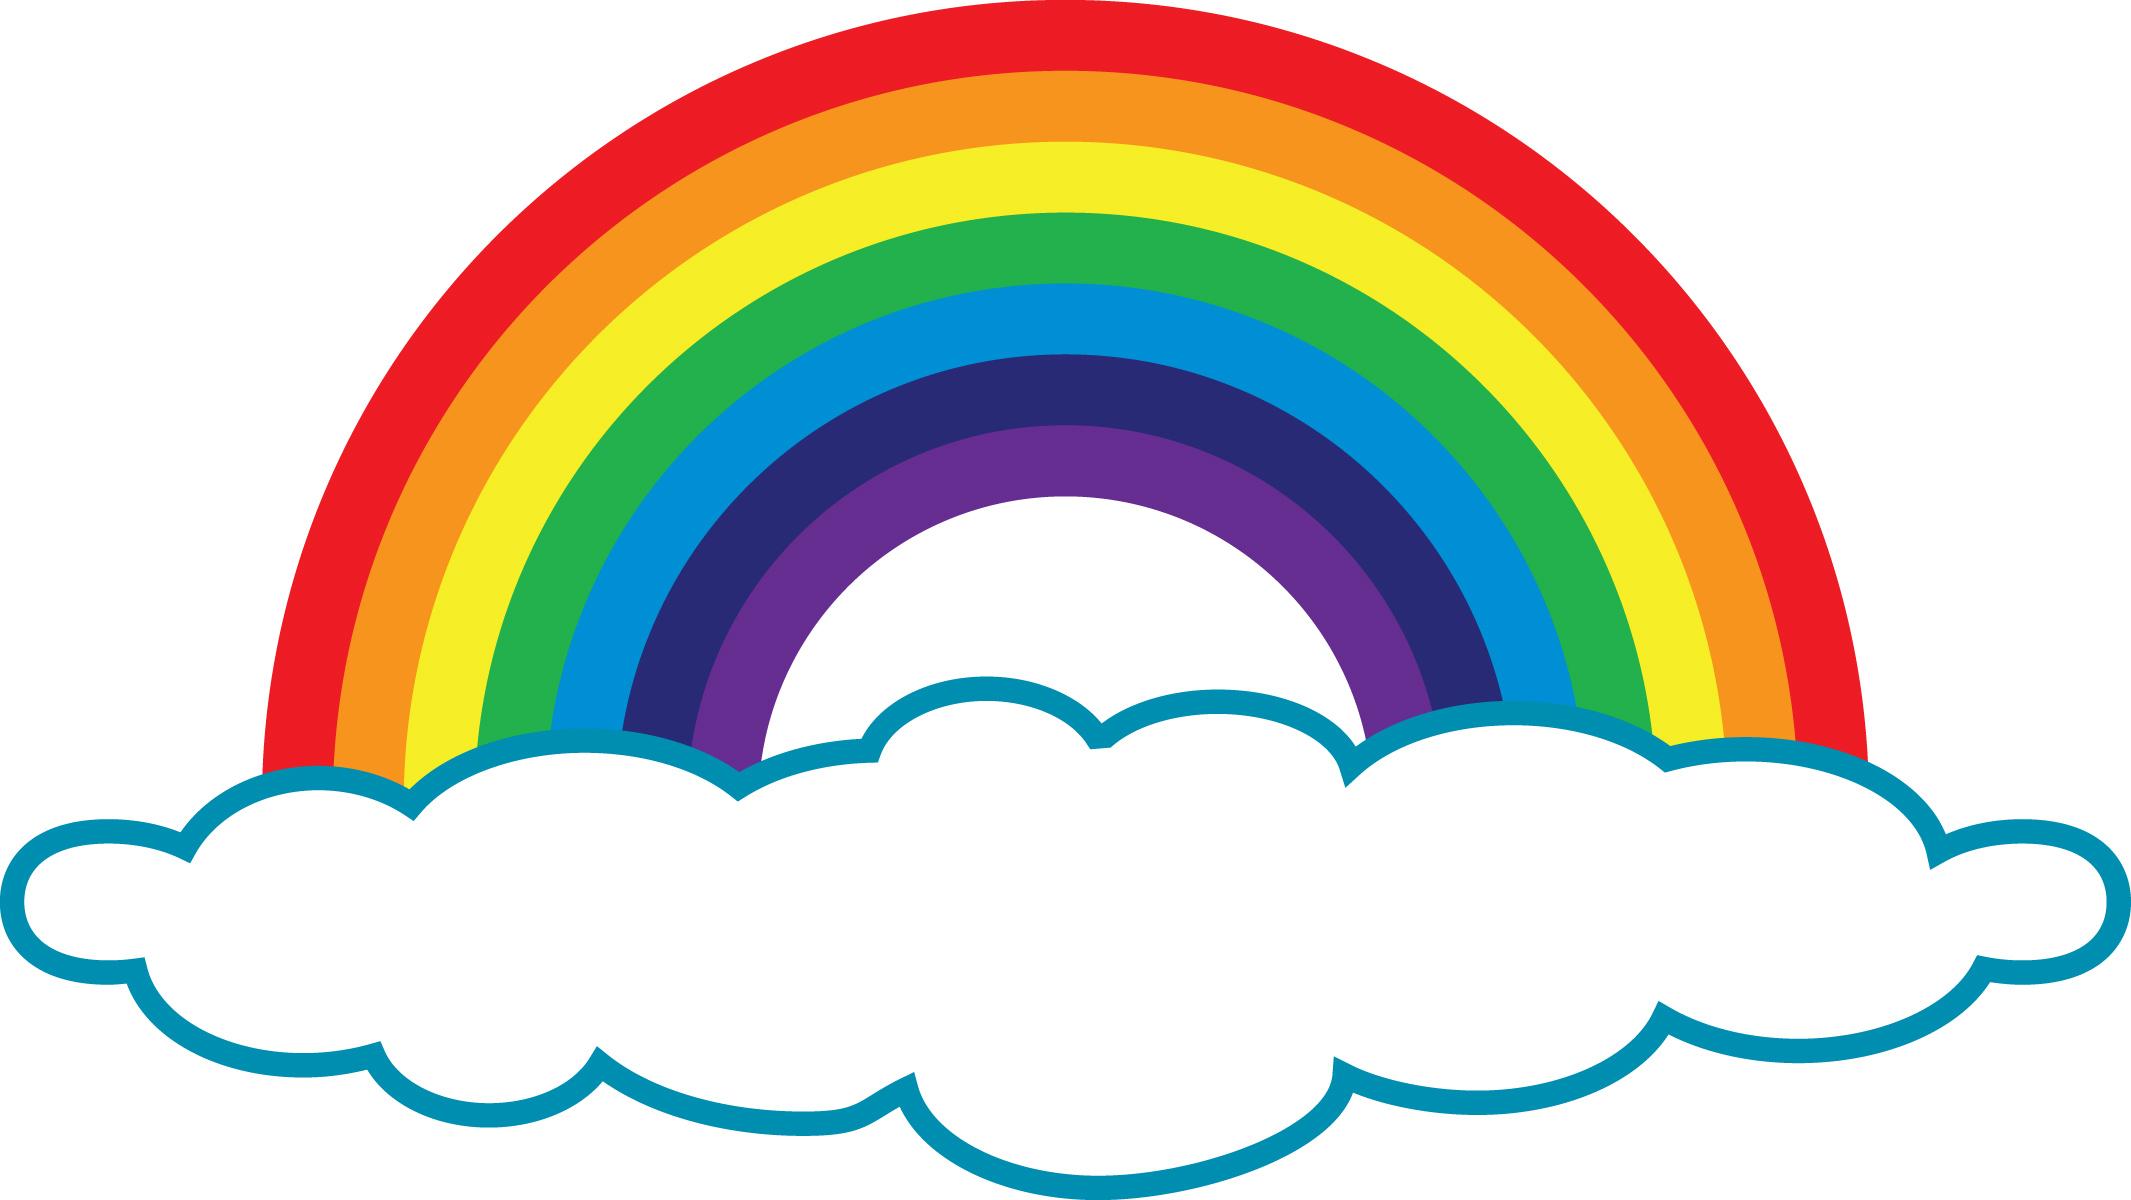 Rainbow Backgrounds, Compatible - PC, Mobile, Gadgets| 2131x1200 px